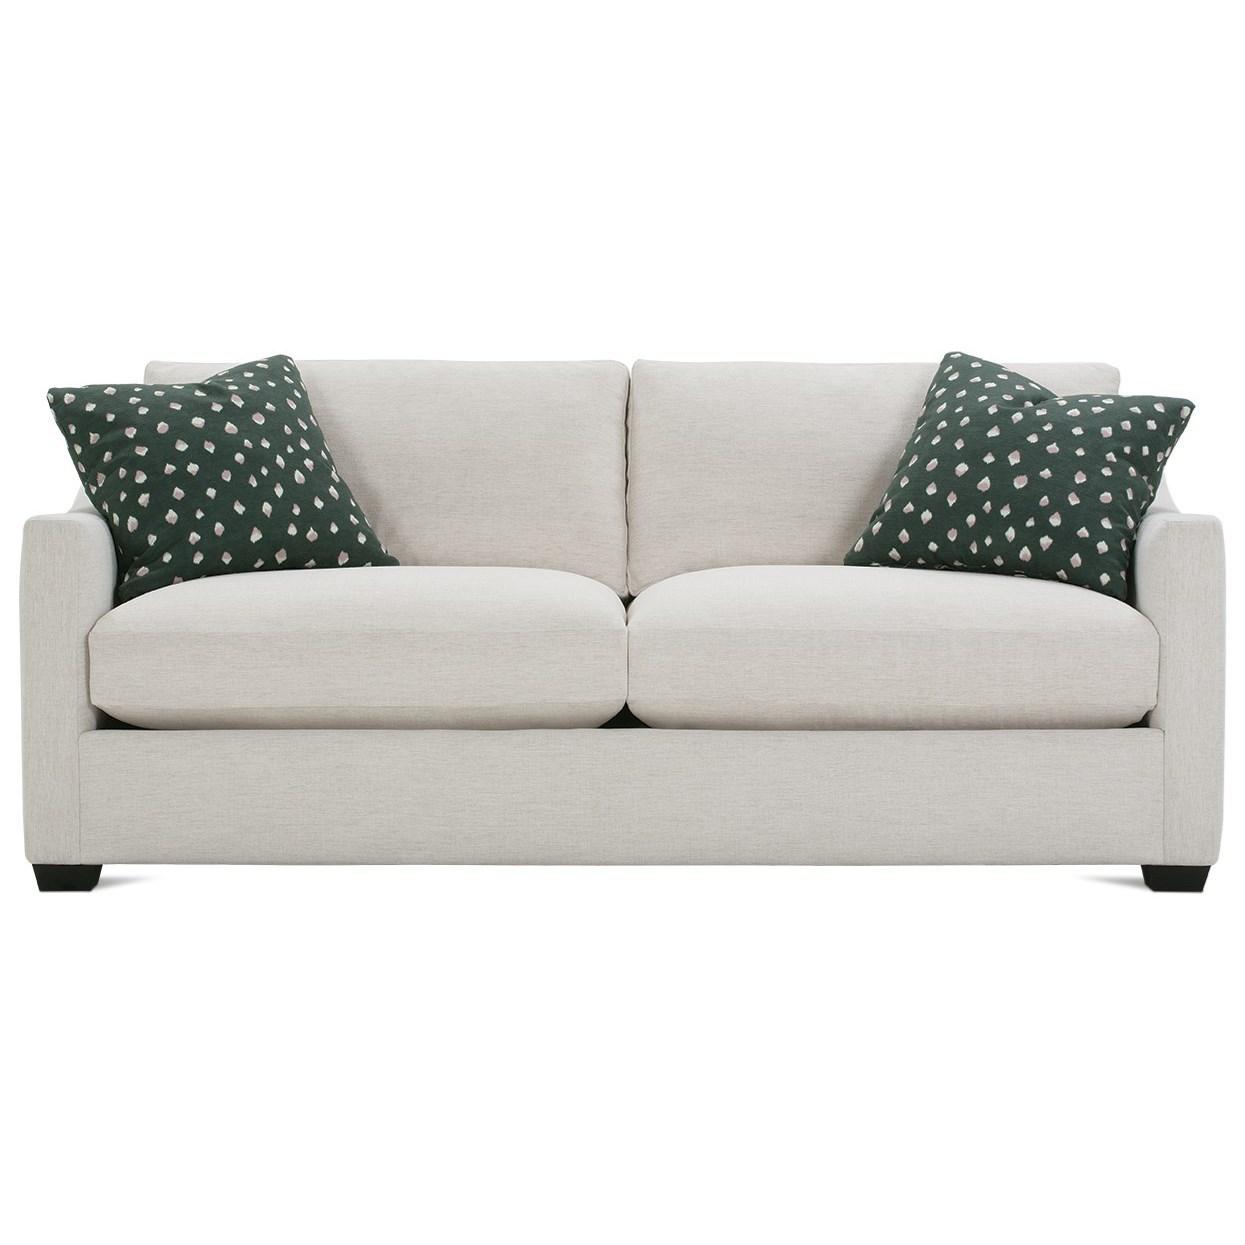 Loose Pillow Back Sofa: Rowe Bradford Transitional Sofa With Loose Pillow Back